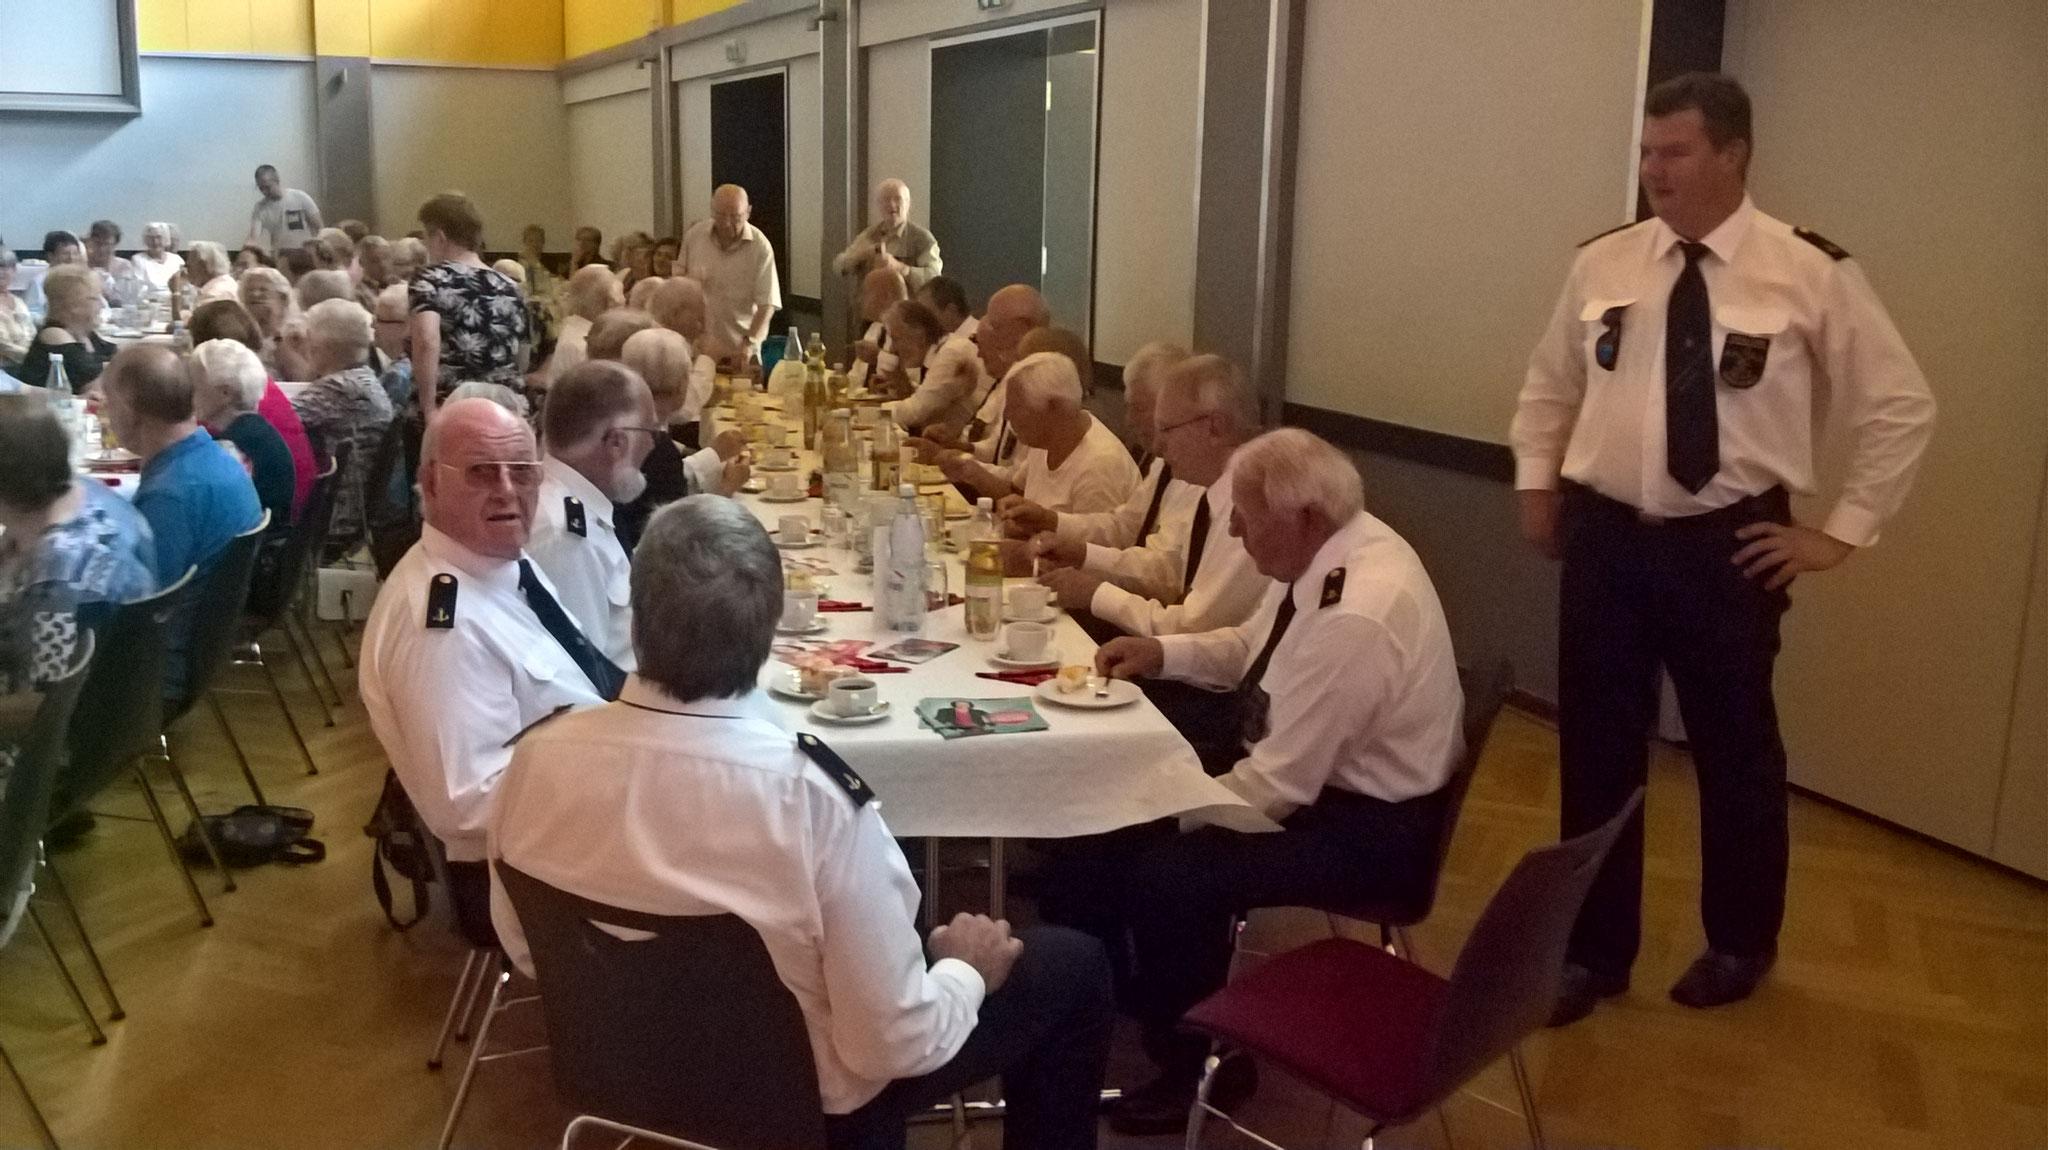 Tisch des Shanty-Chor Romantik Sailors Iserlohn